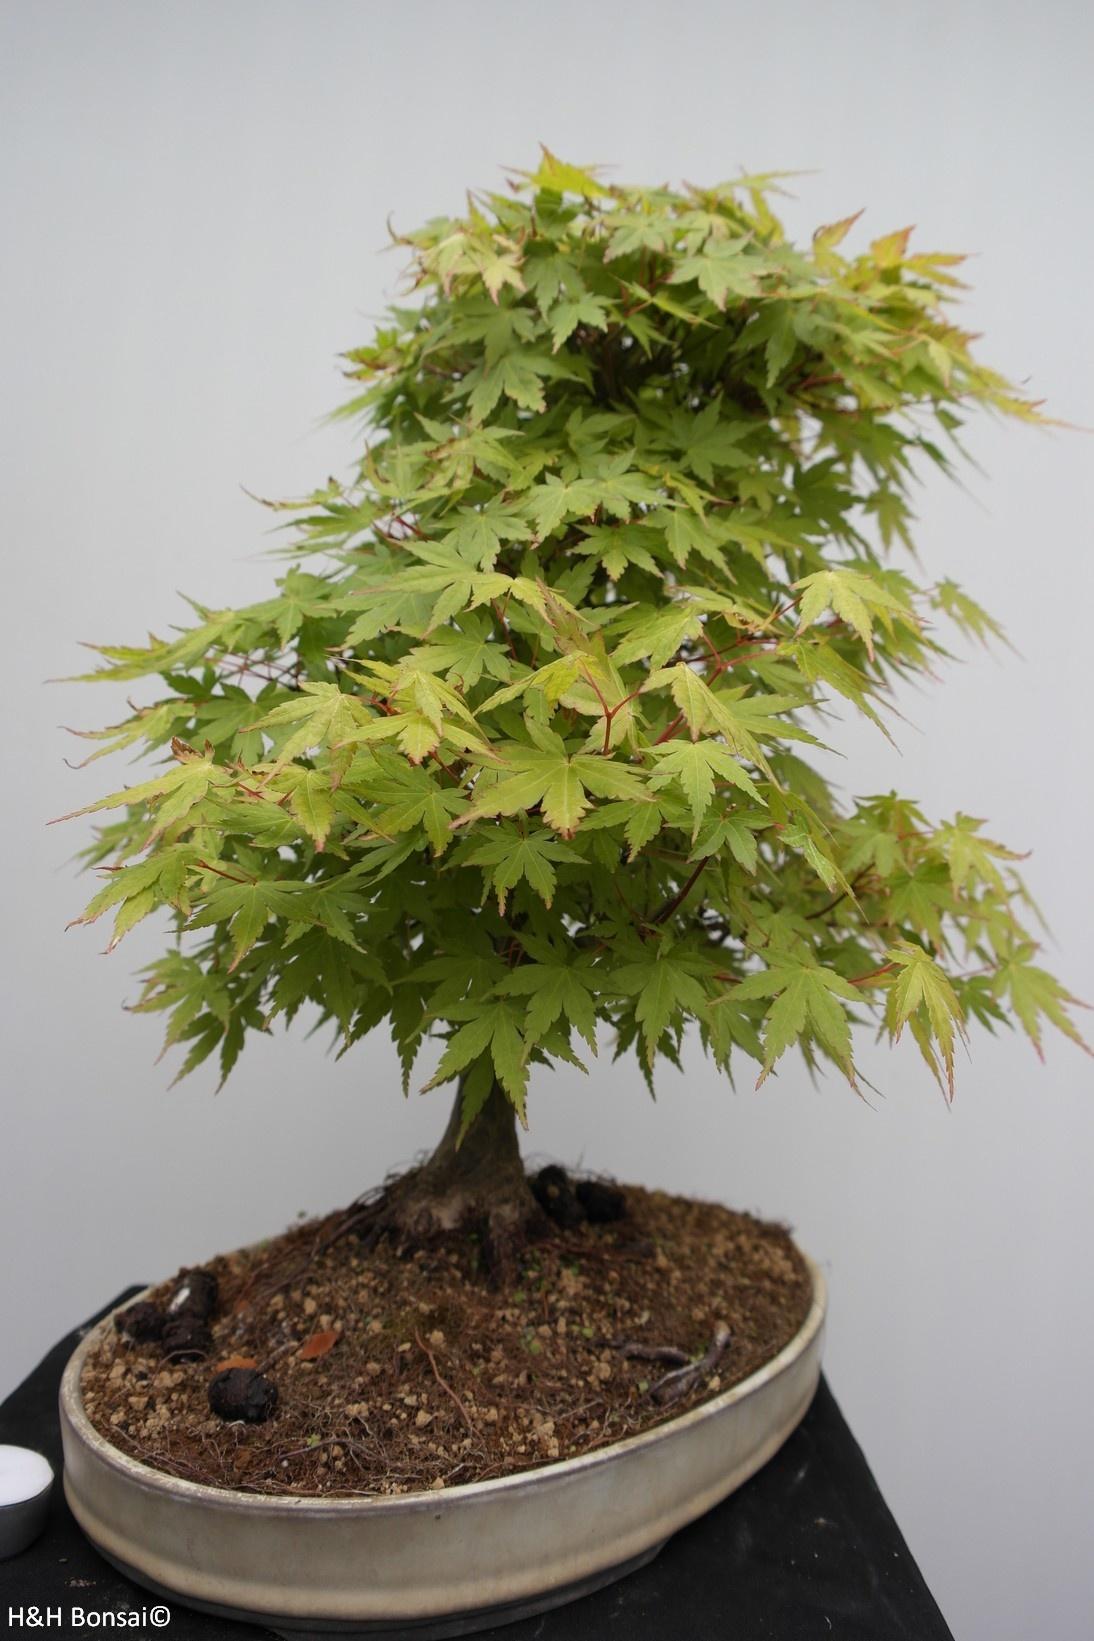 Bonsai Acer palmatum, Japanse esdoorn, nr. 7764